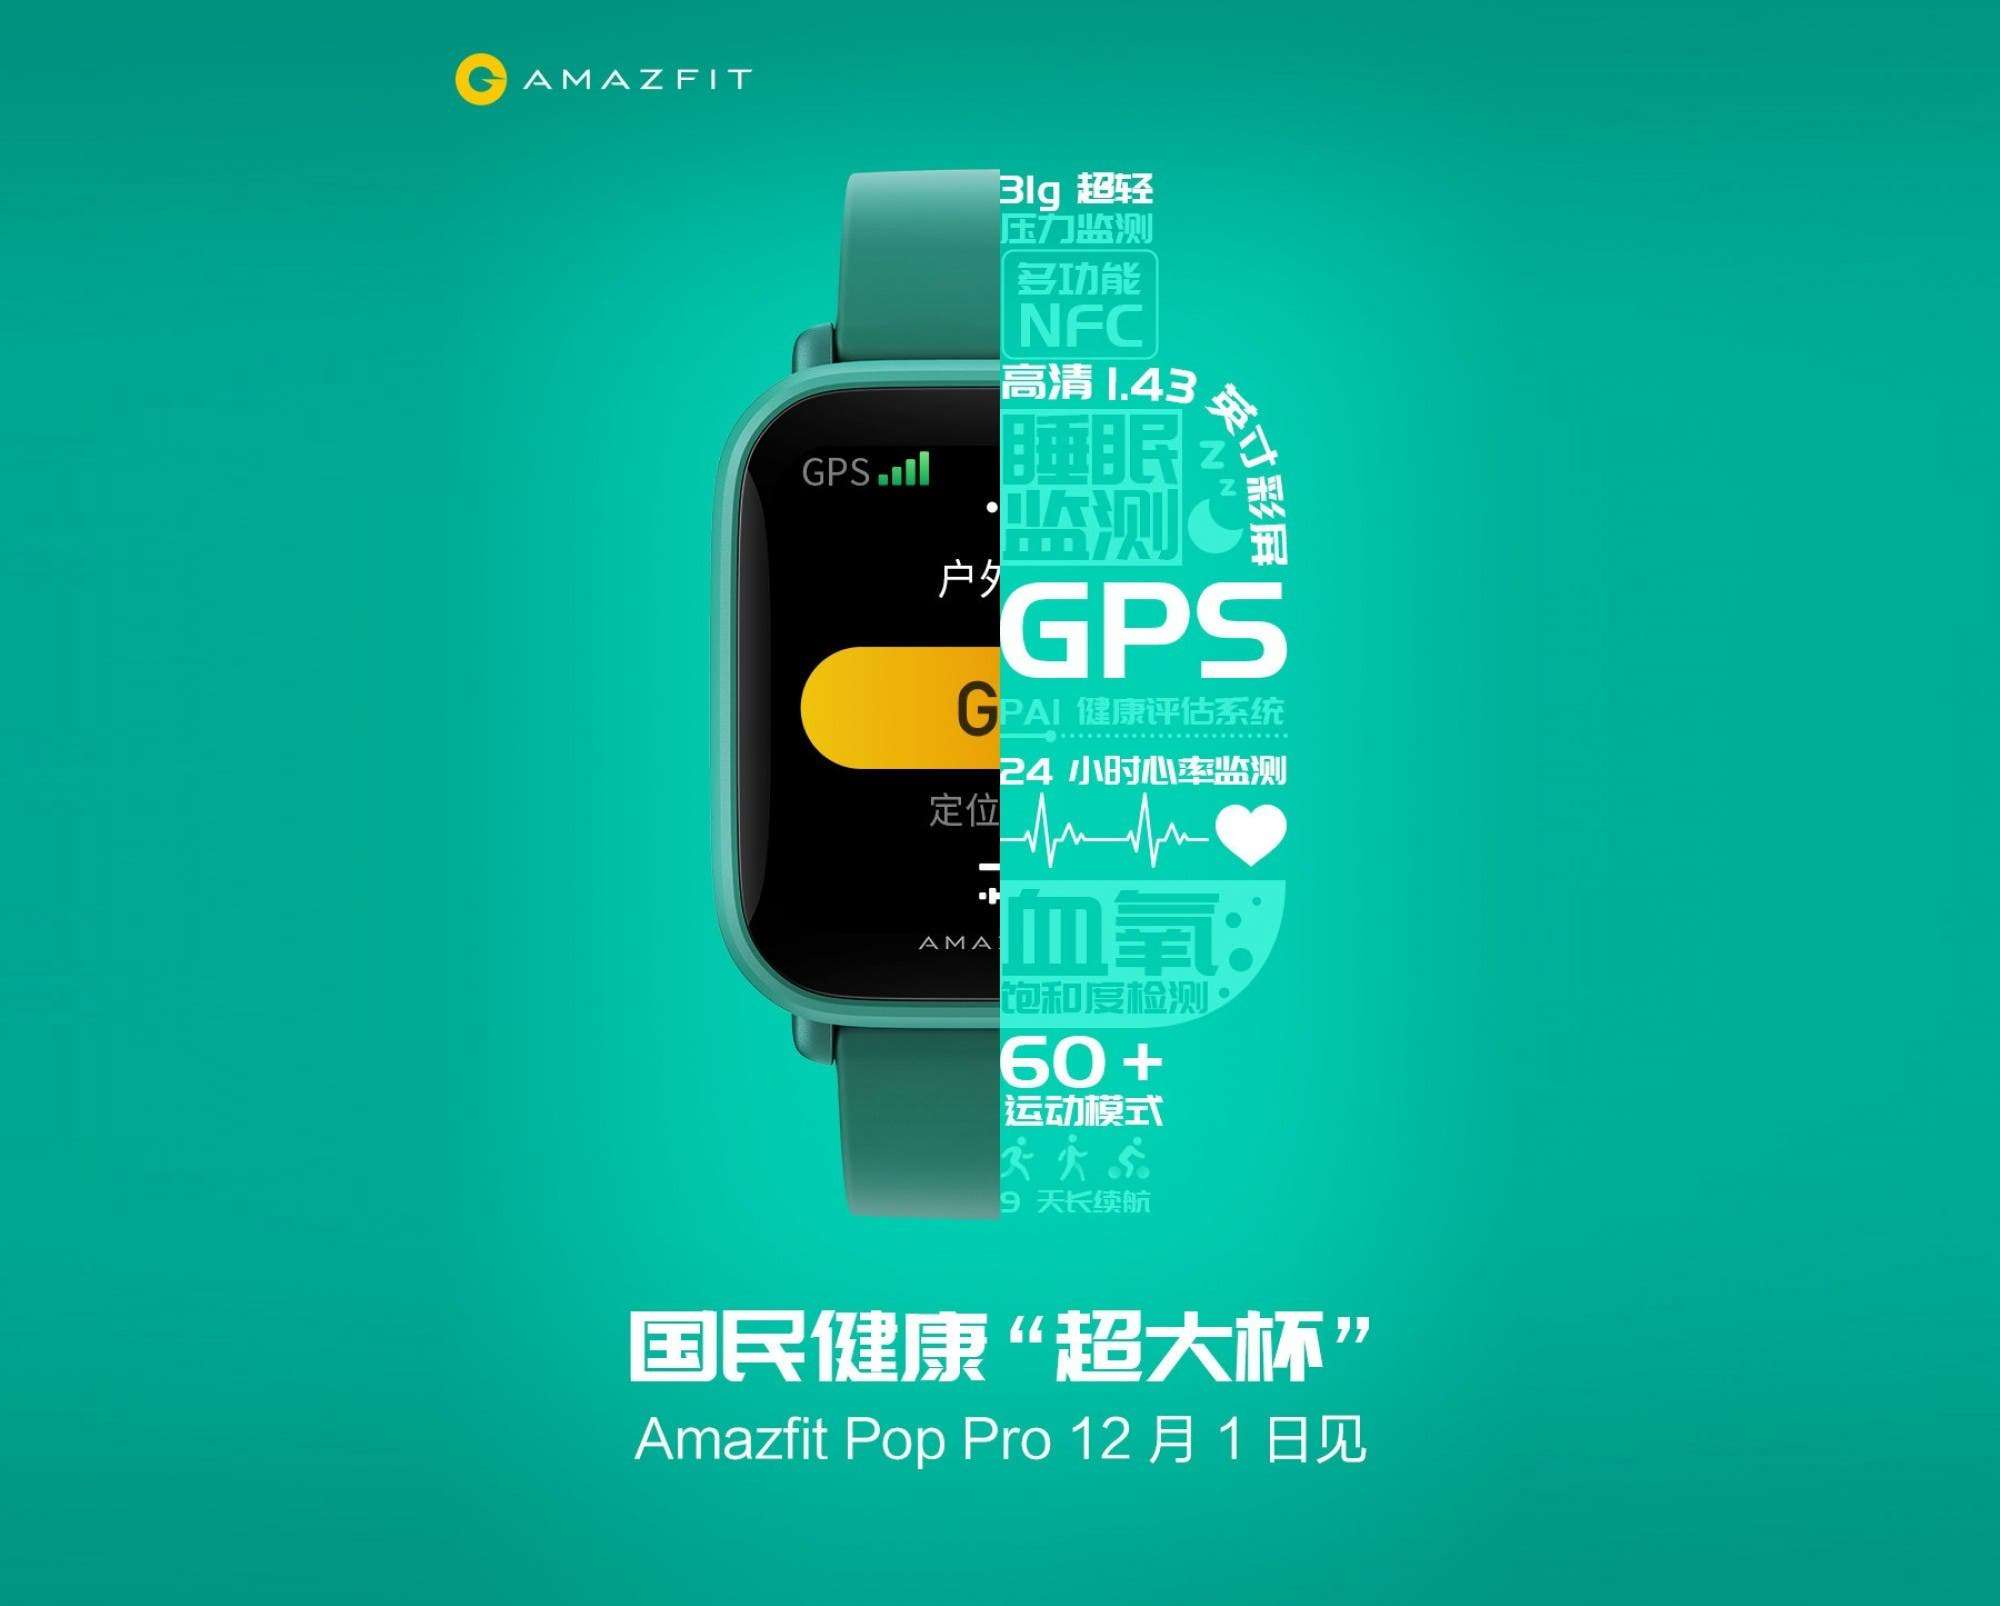 Amazfit Pop Pro